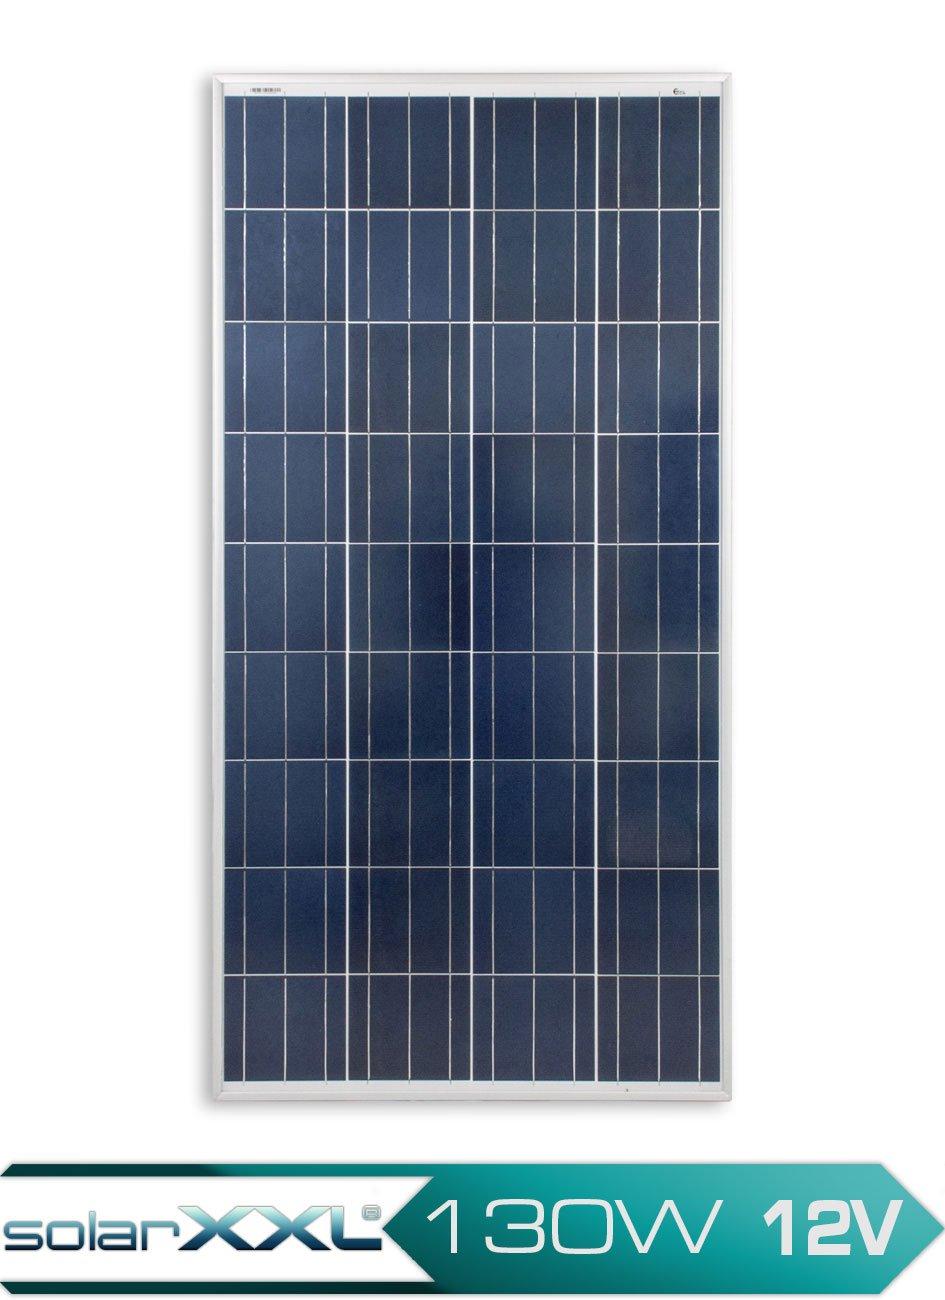 130 Watt Solarpanel 12V Polykristallin Solar Modul Photovoltaik Busbar Wohnmobil Camping solarXXL